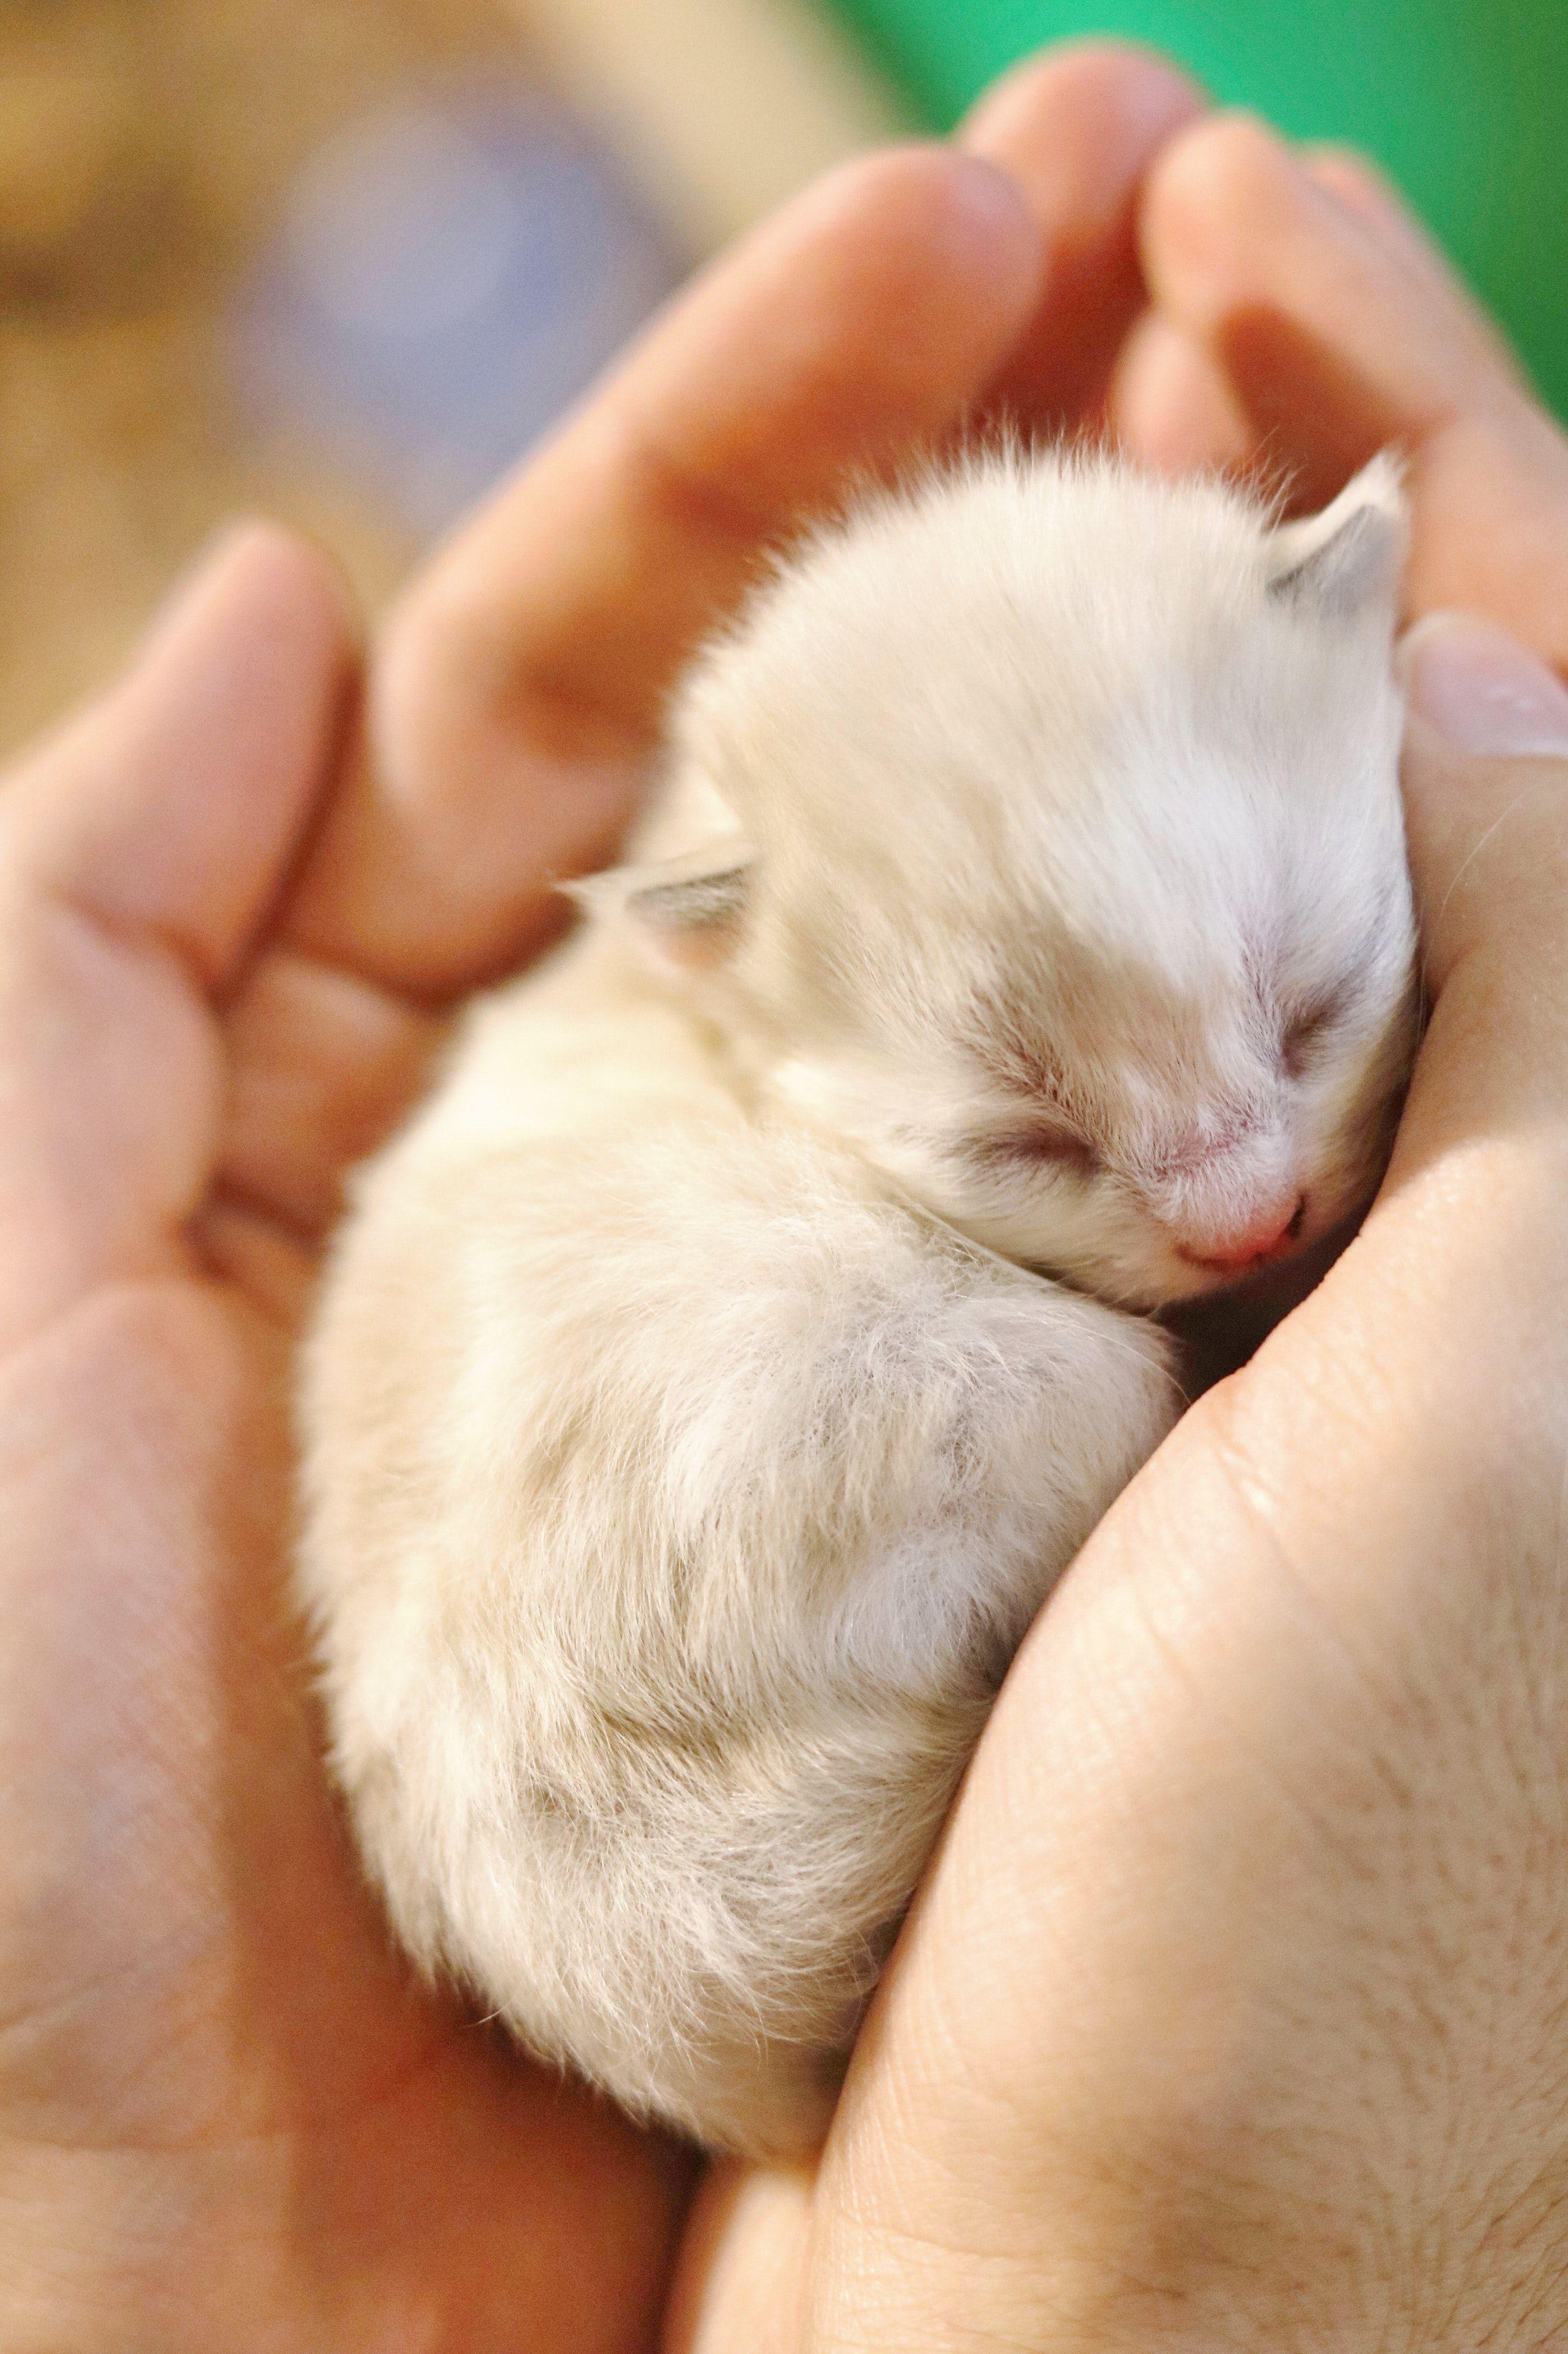 Person Holding White Kitten Photo By Sampaeez On Unsplash Image